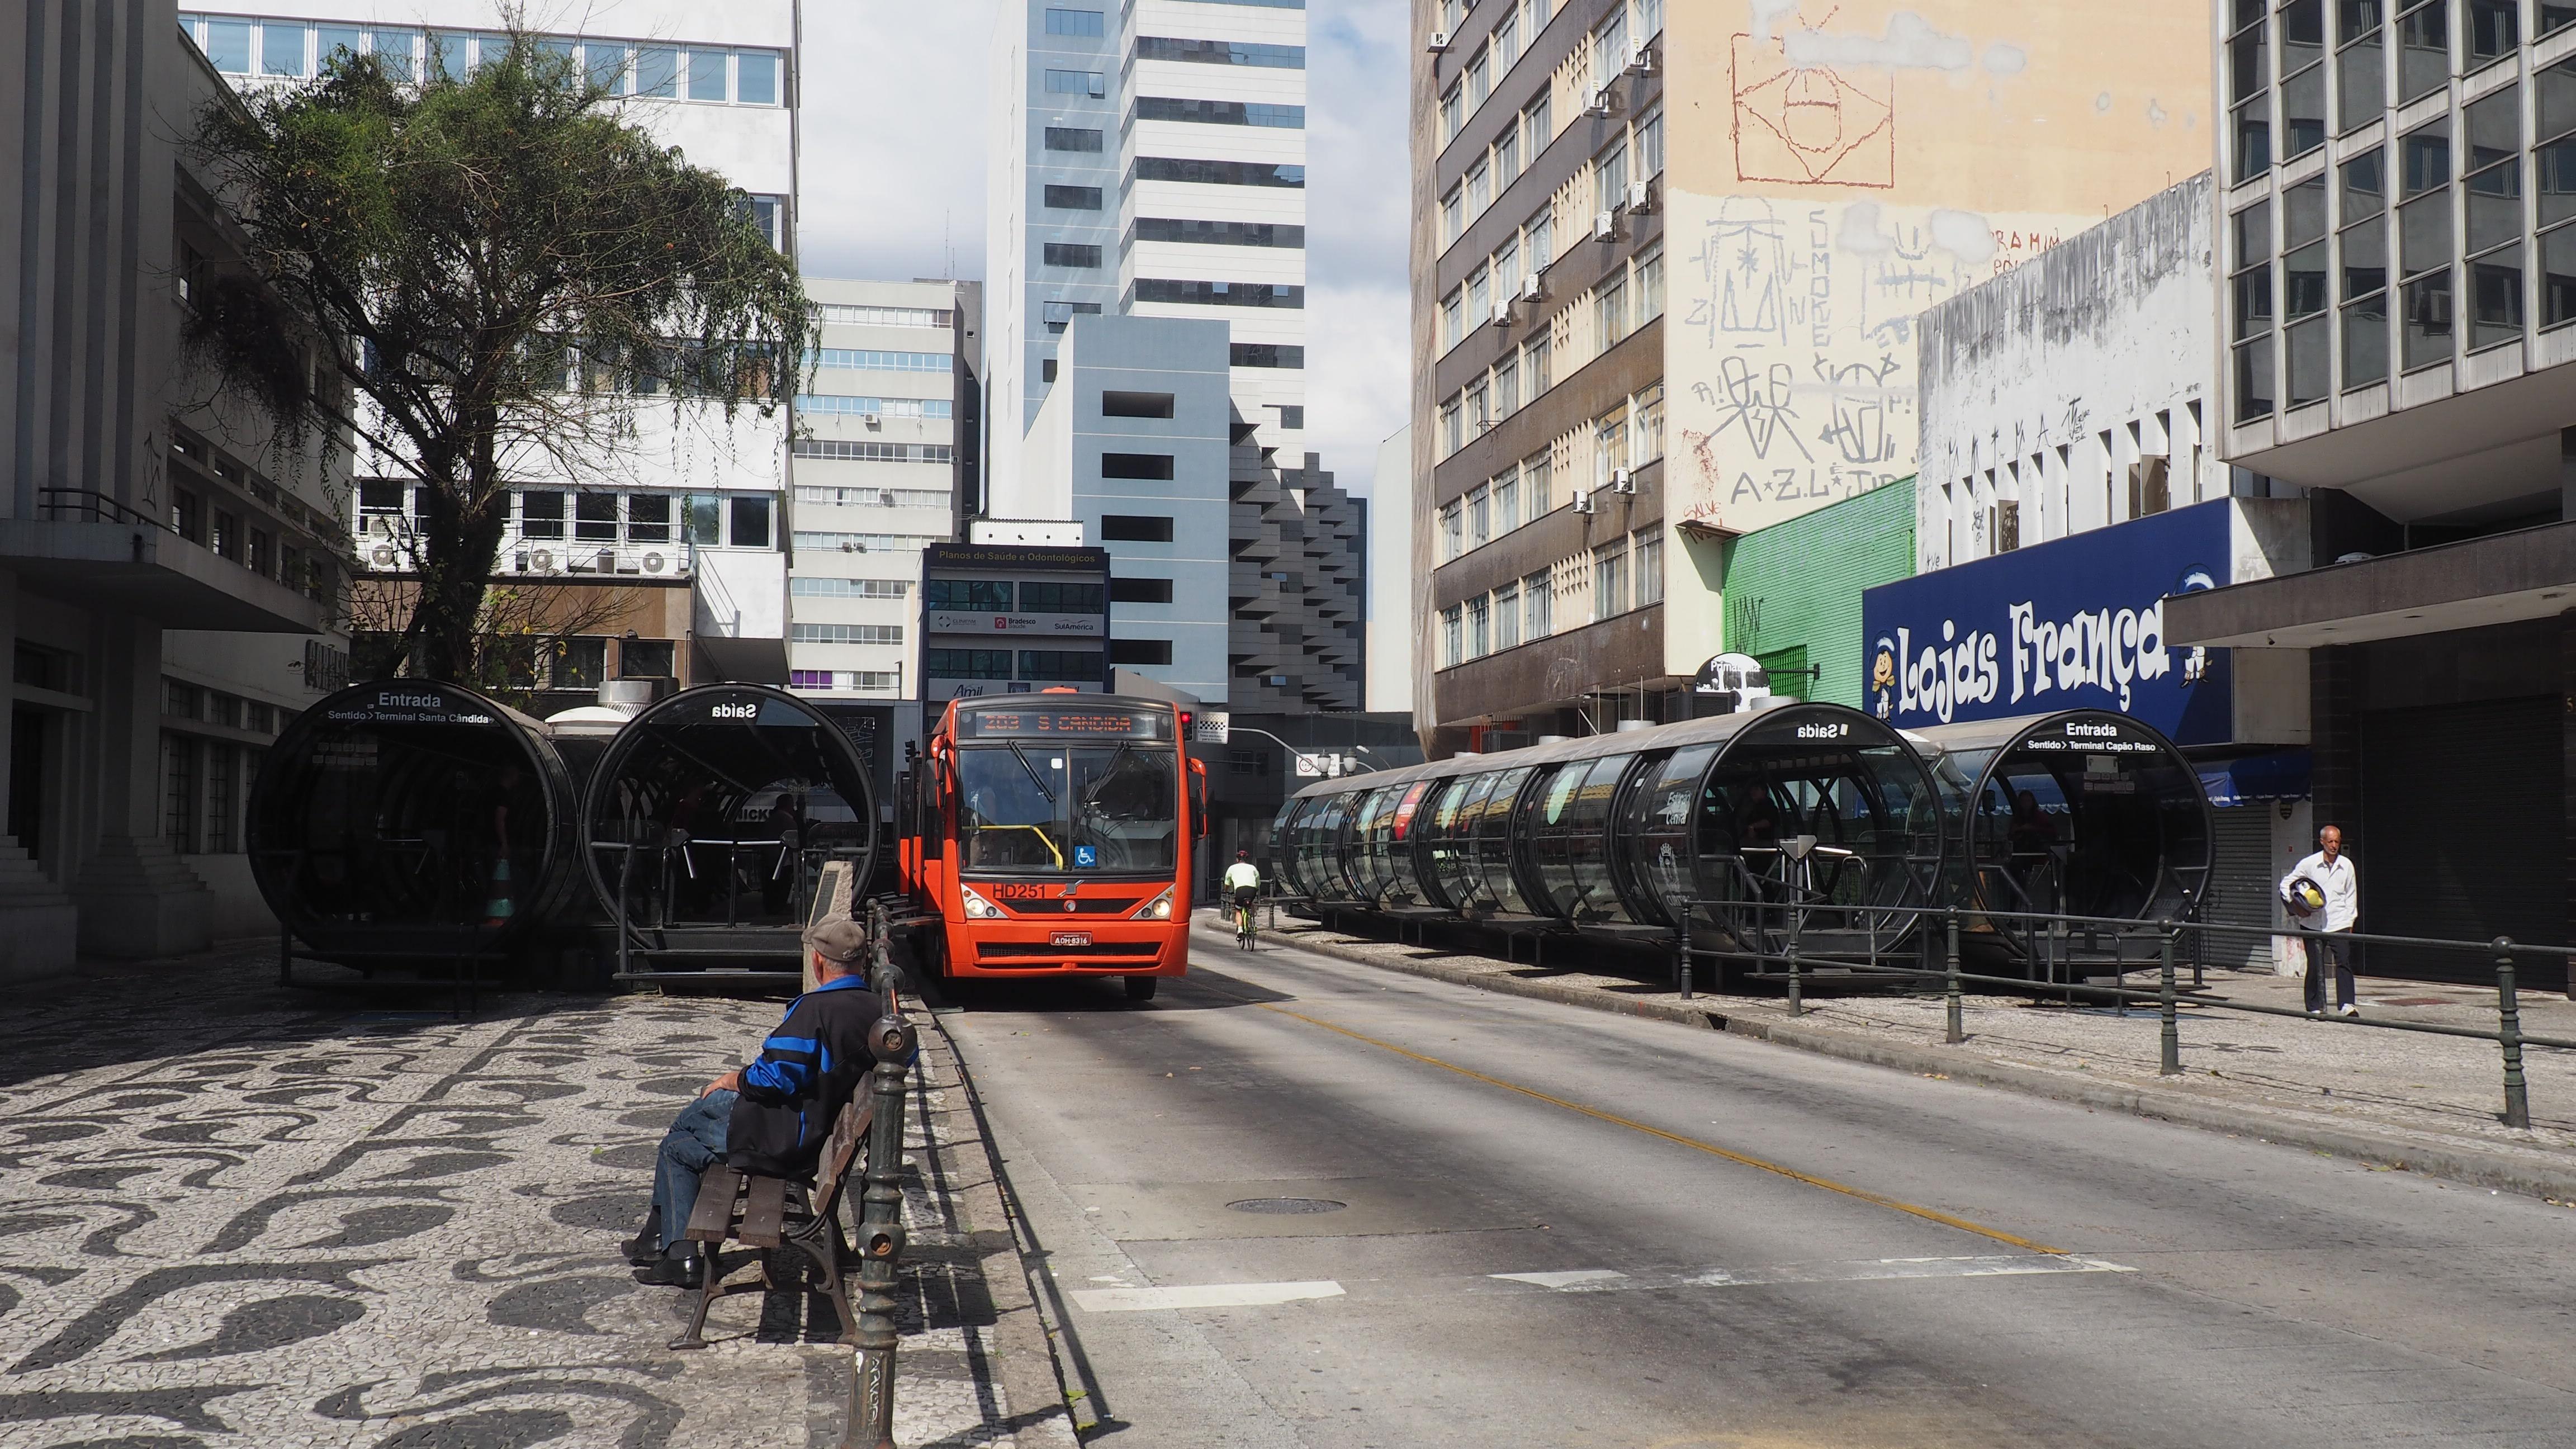 Las modernas paradas de autobús de Curitiba